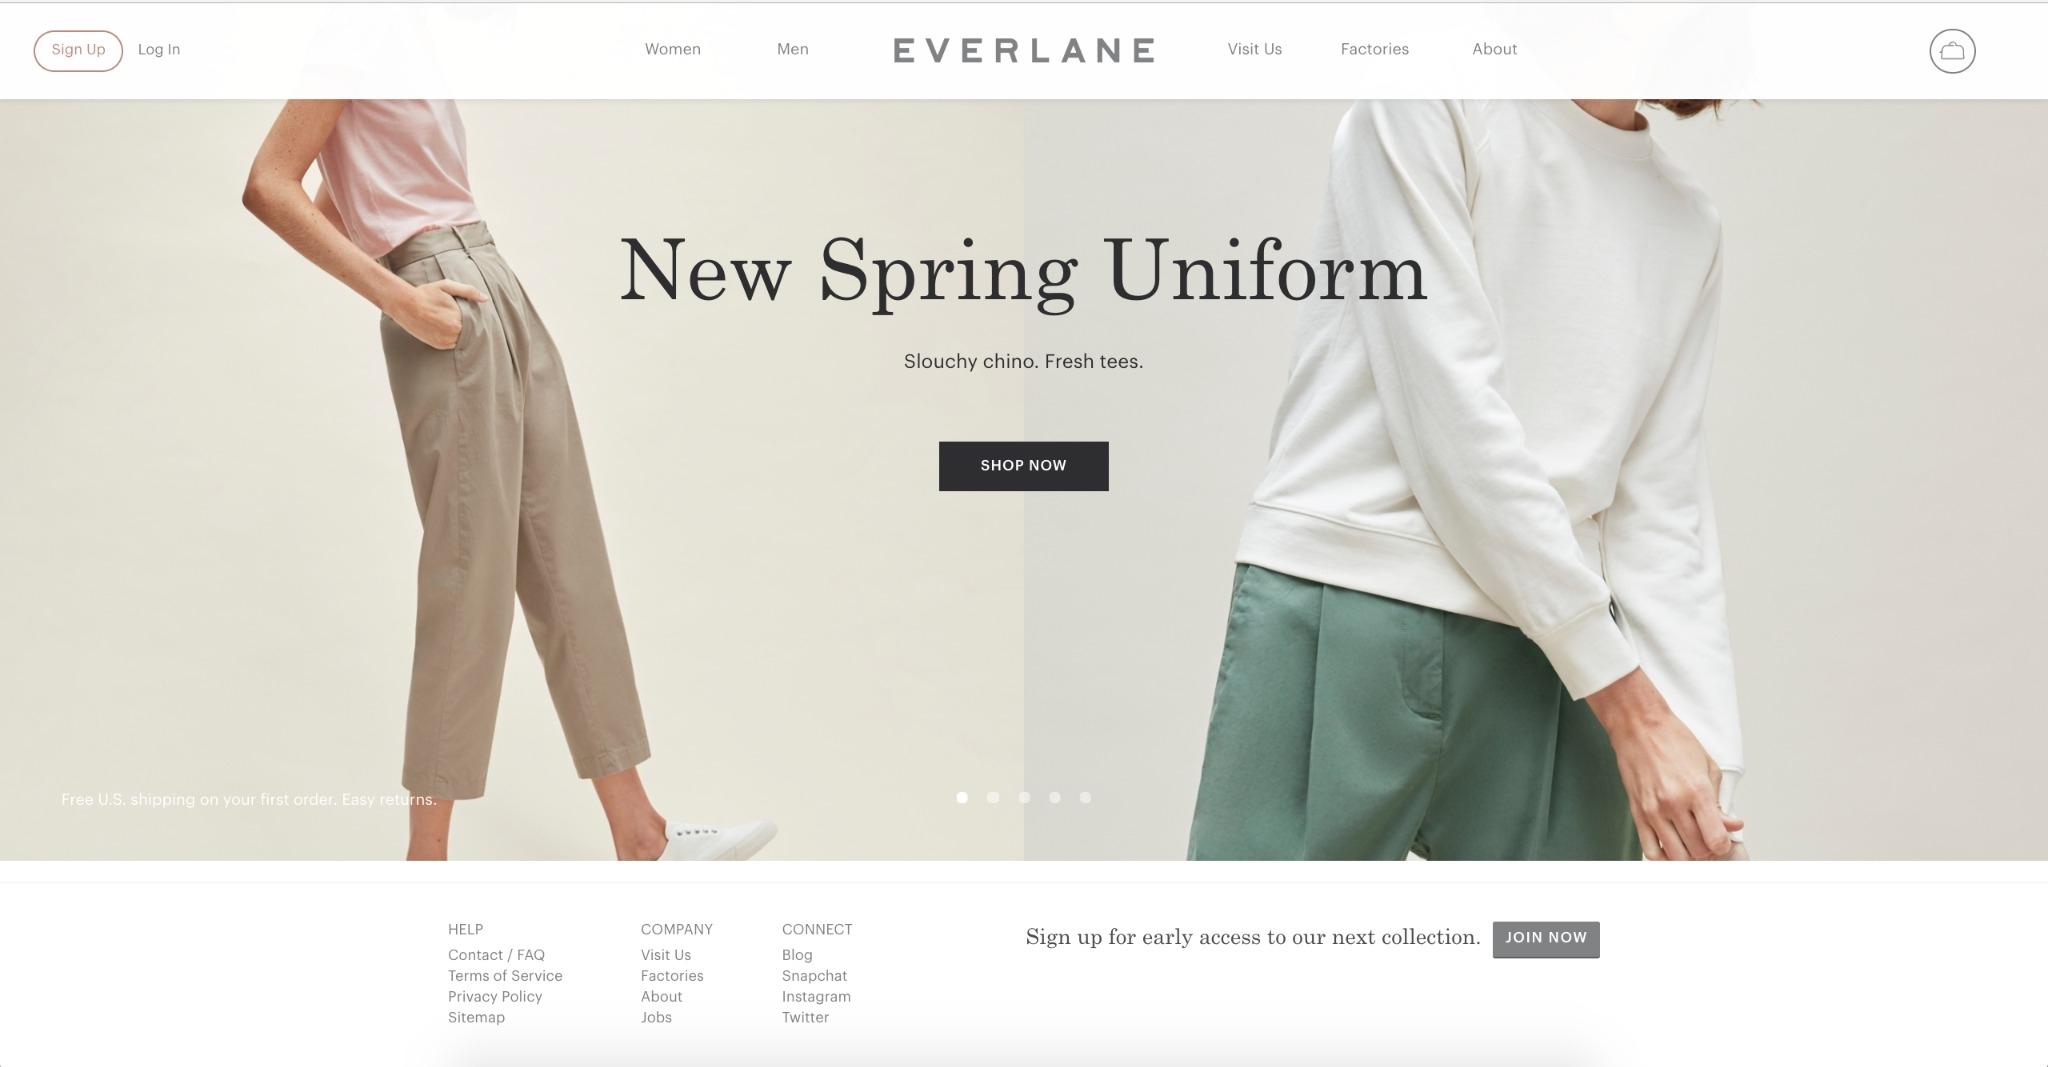 Everlane coupon code